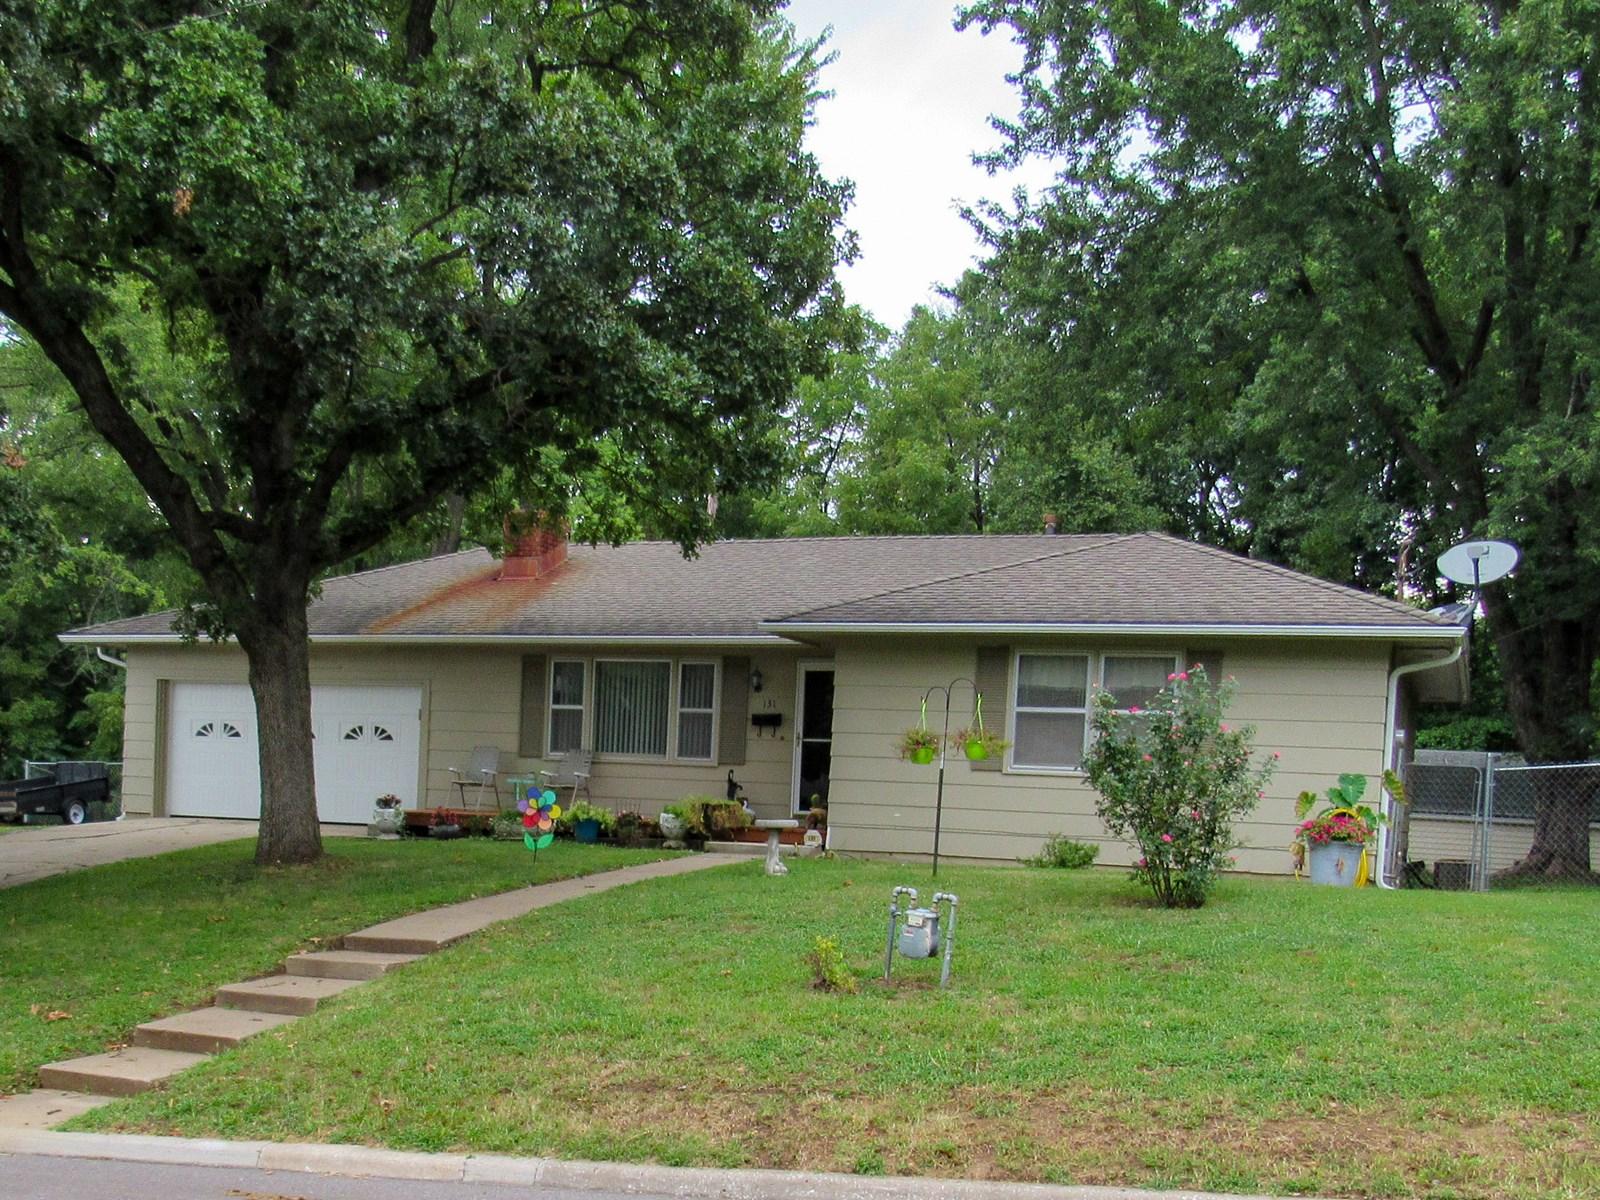 Ranch Home in Bonner Springs, KS For Sale